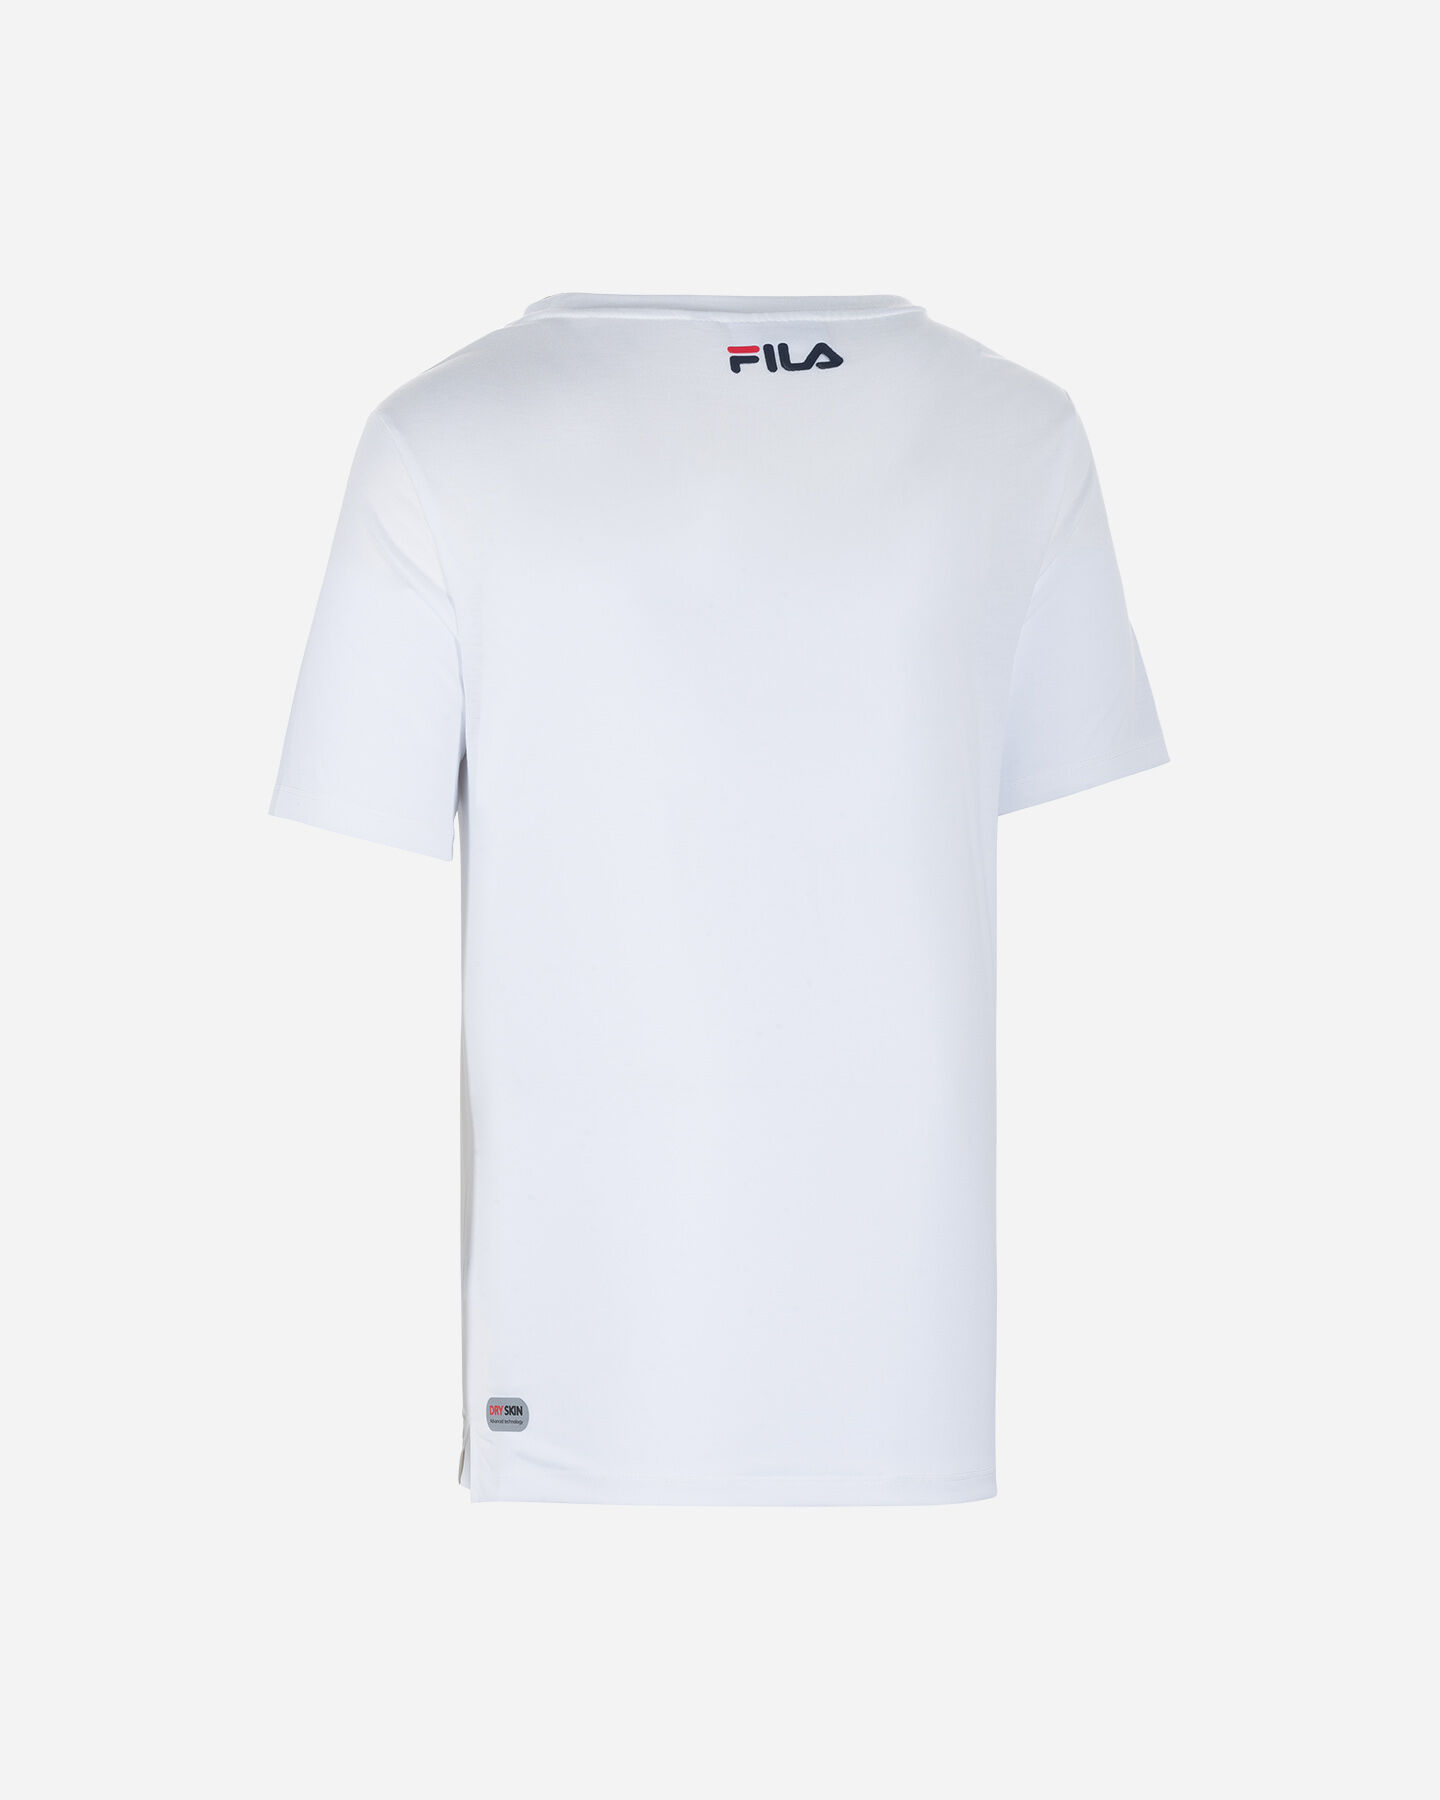 T-Shirt tennis FILA TENNIS BIG LOGO M S4075792 scatto 1